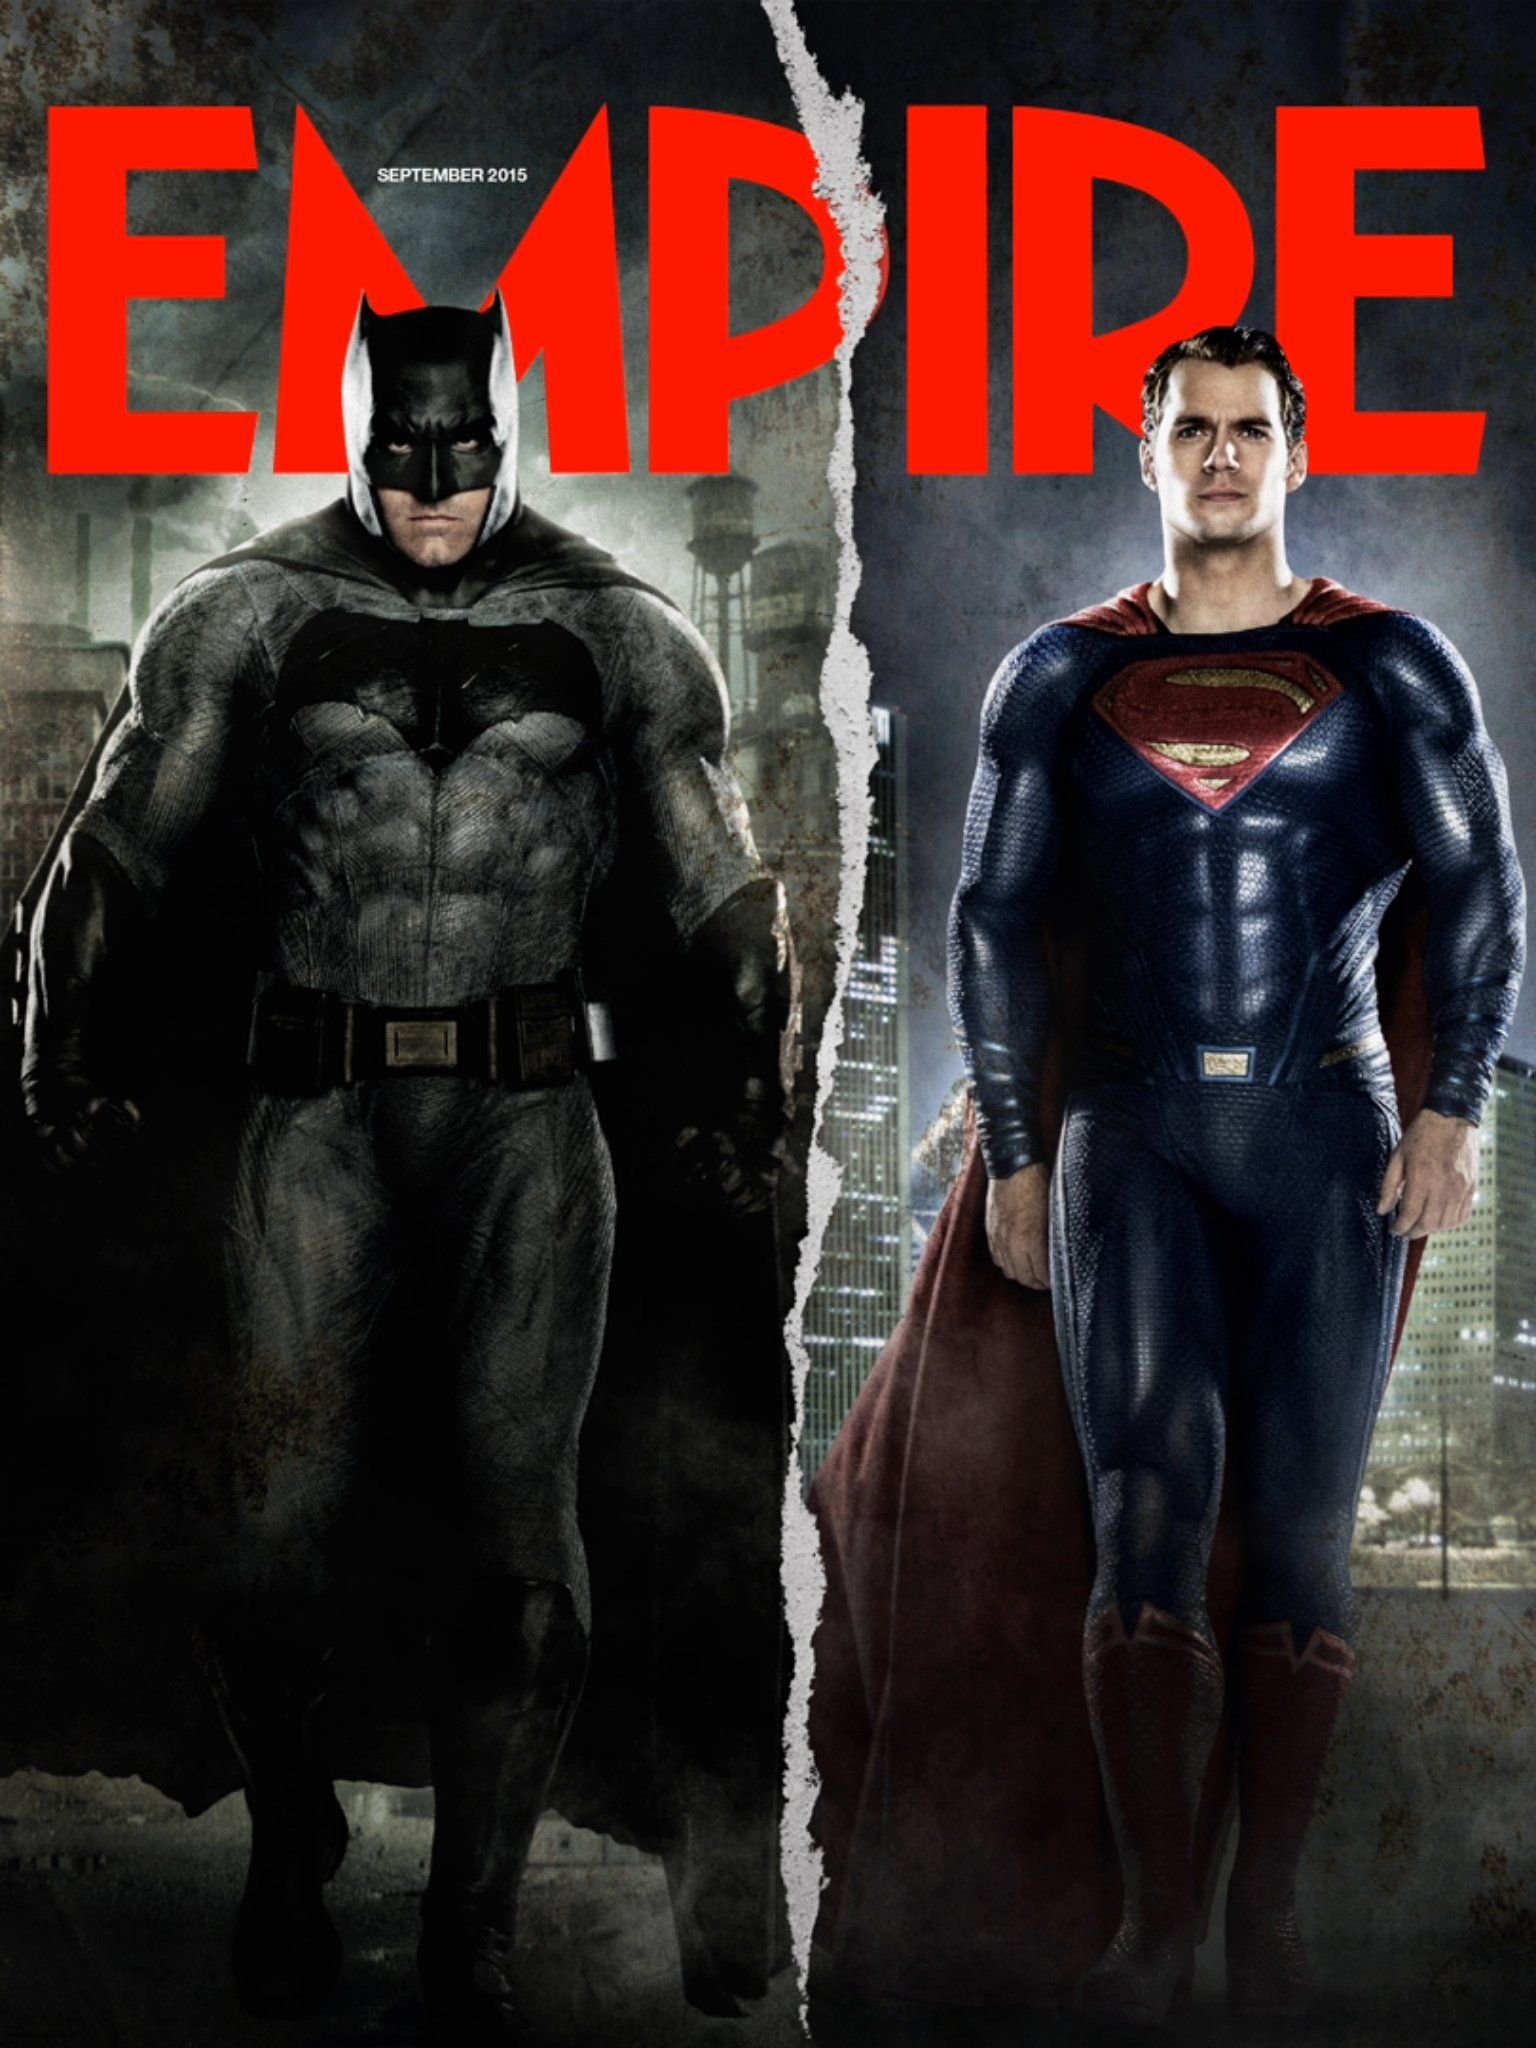 Batman Vs Superman Images Feature Bruce Wayne And Clark Kent